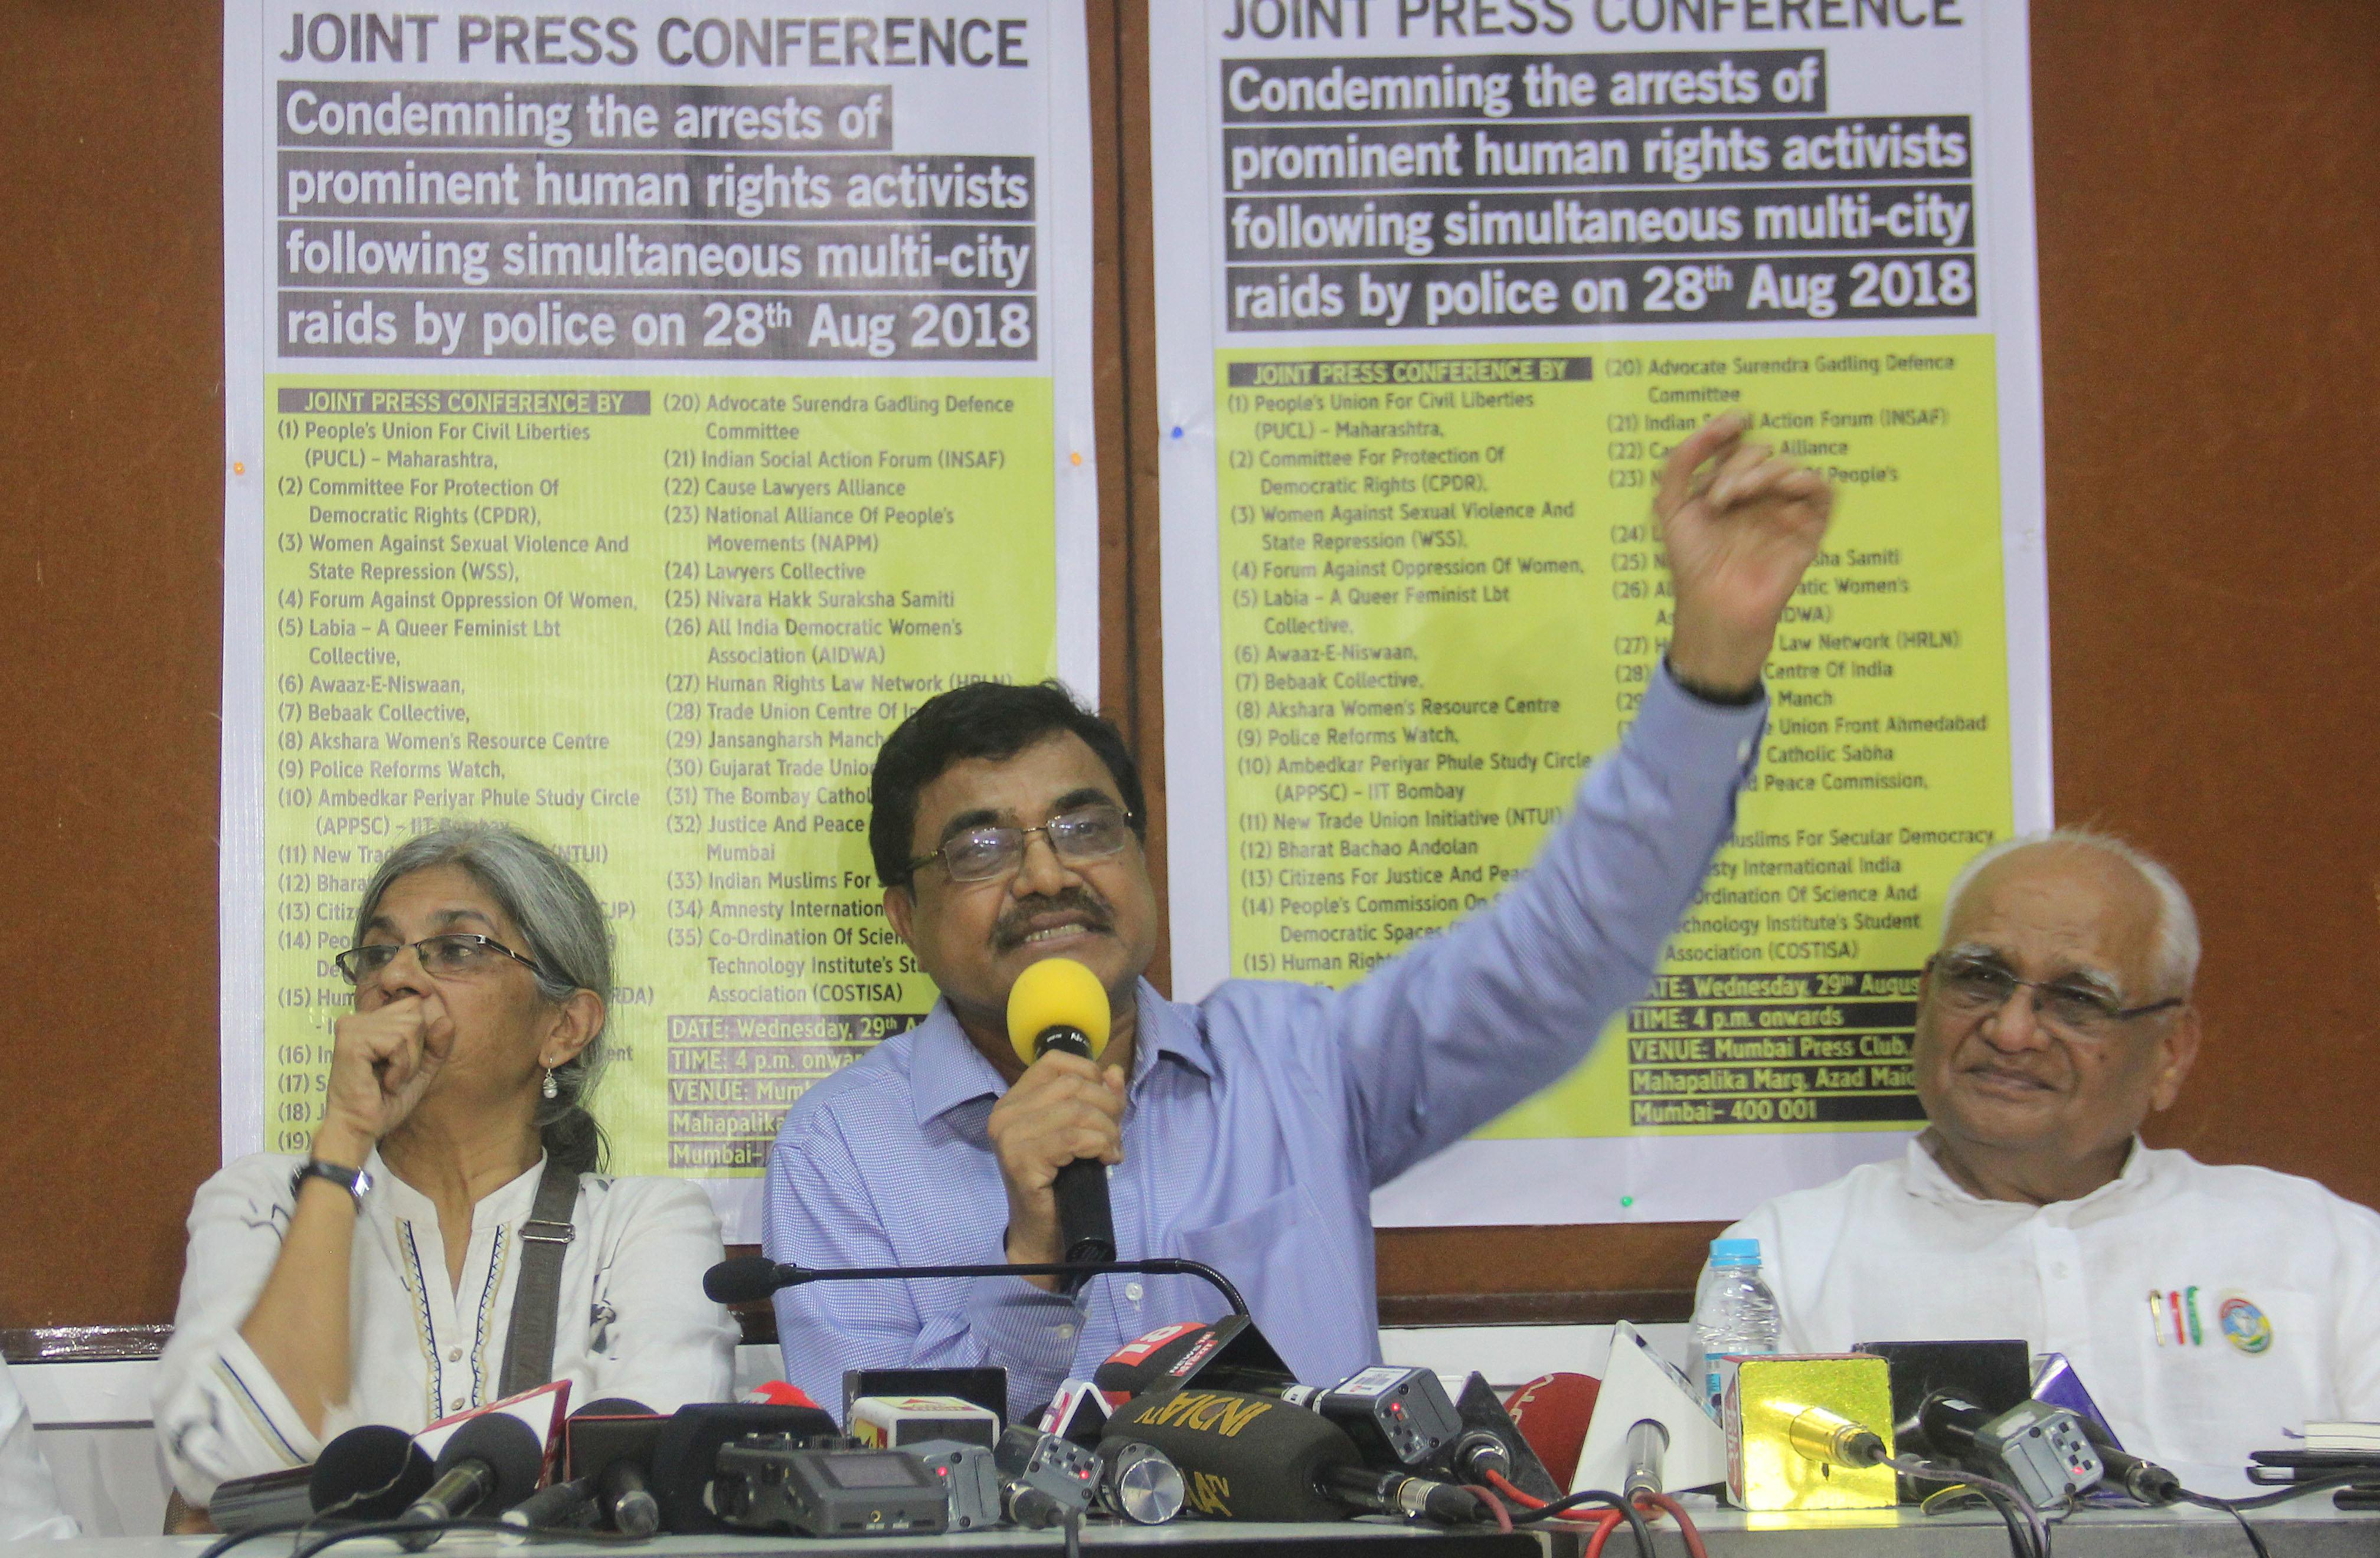 Bhima Koregaon: SC Refuses To Quash FIR Against Activist Anand